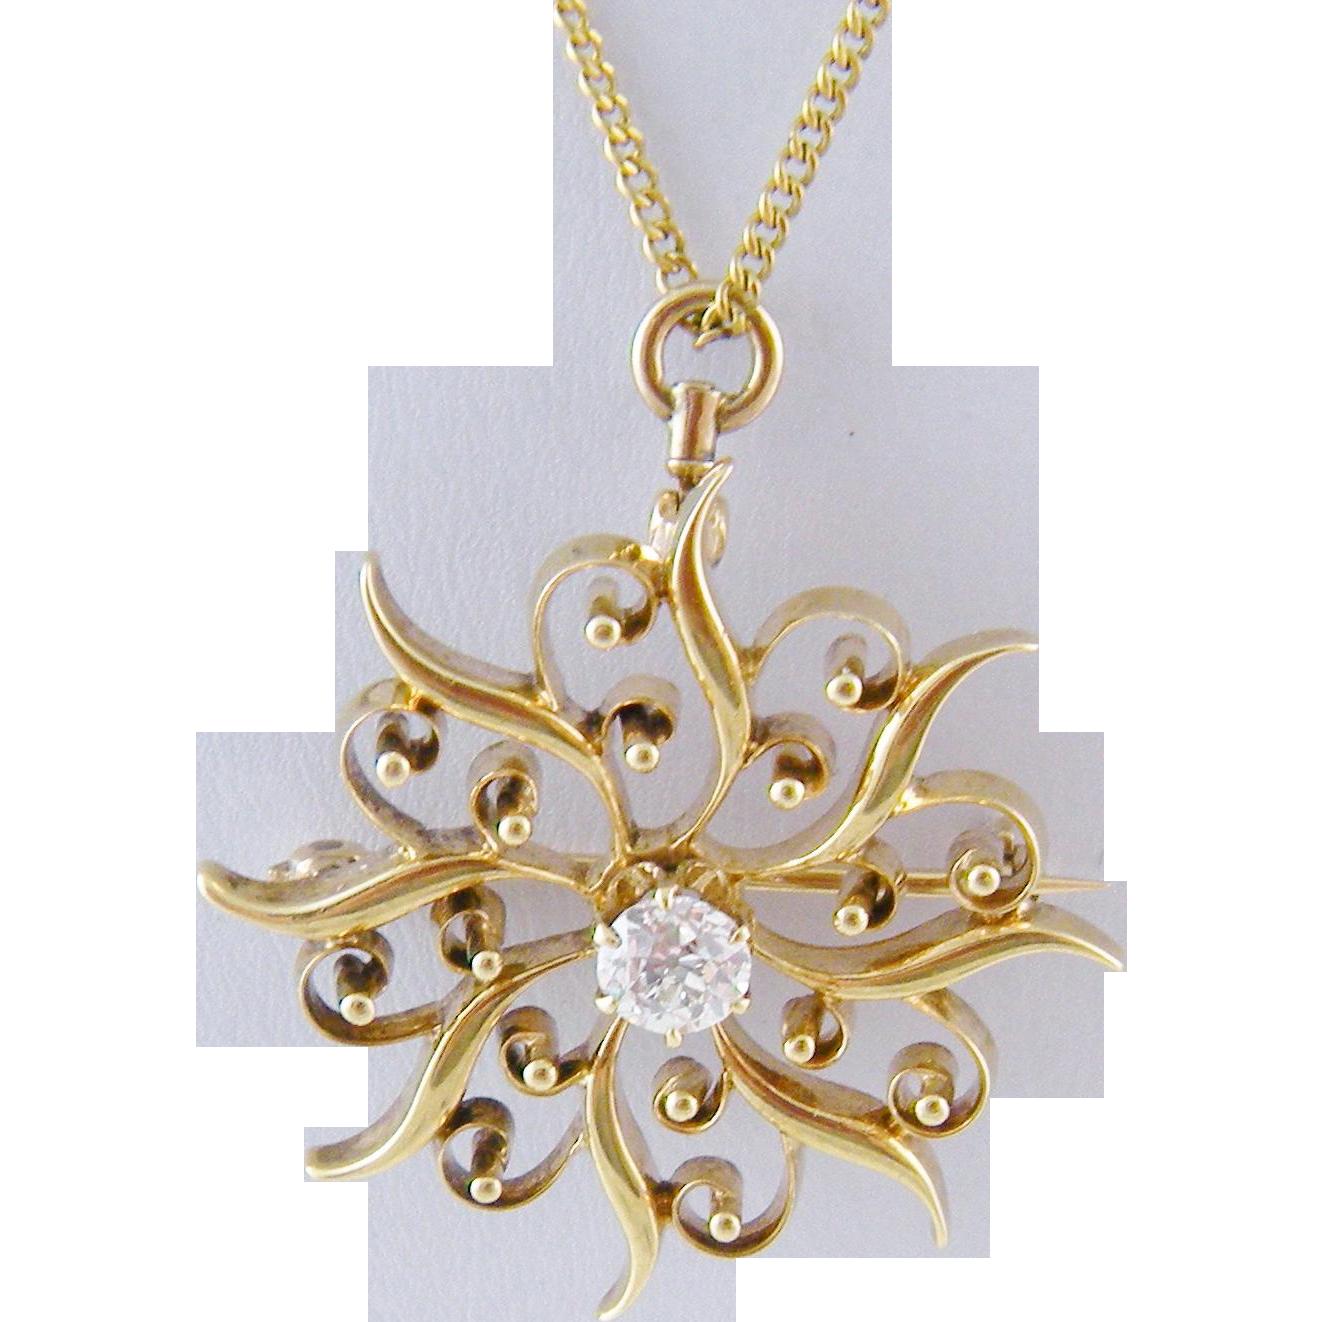 Vintage 14 Kt Gold Star Burst  with  .45 CARAT EUROPEAN Cut Center Diamond Pendant